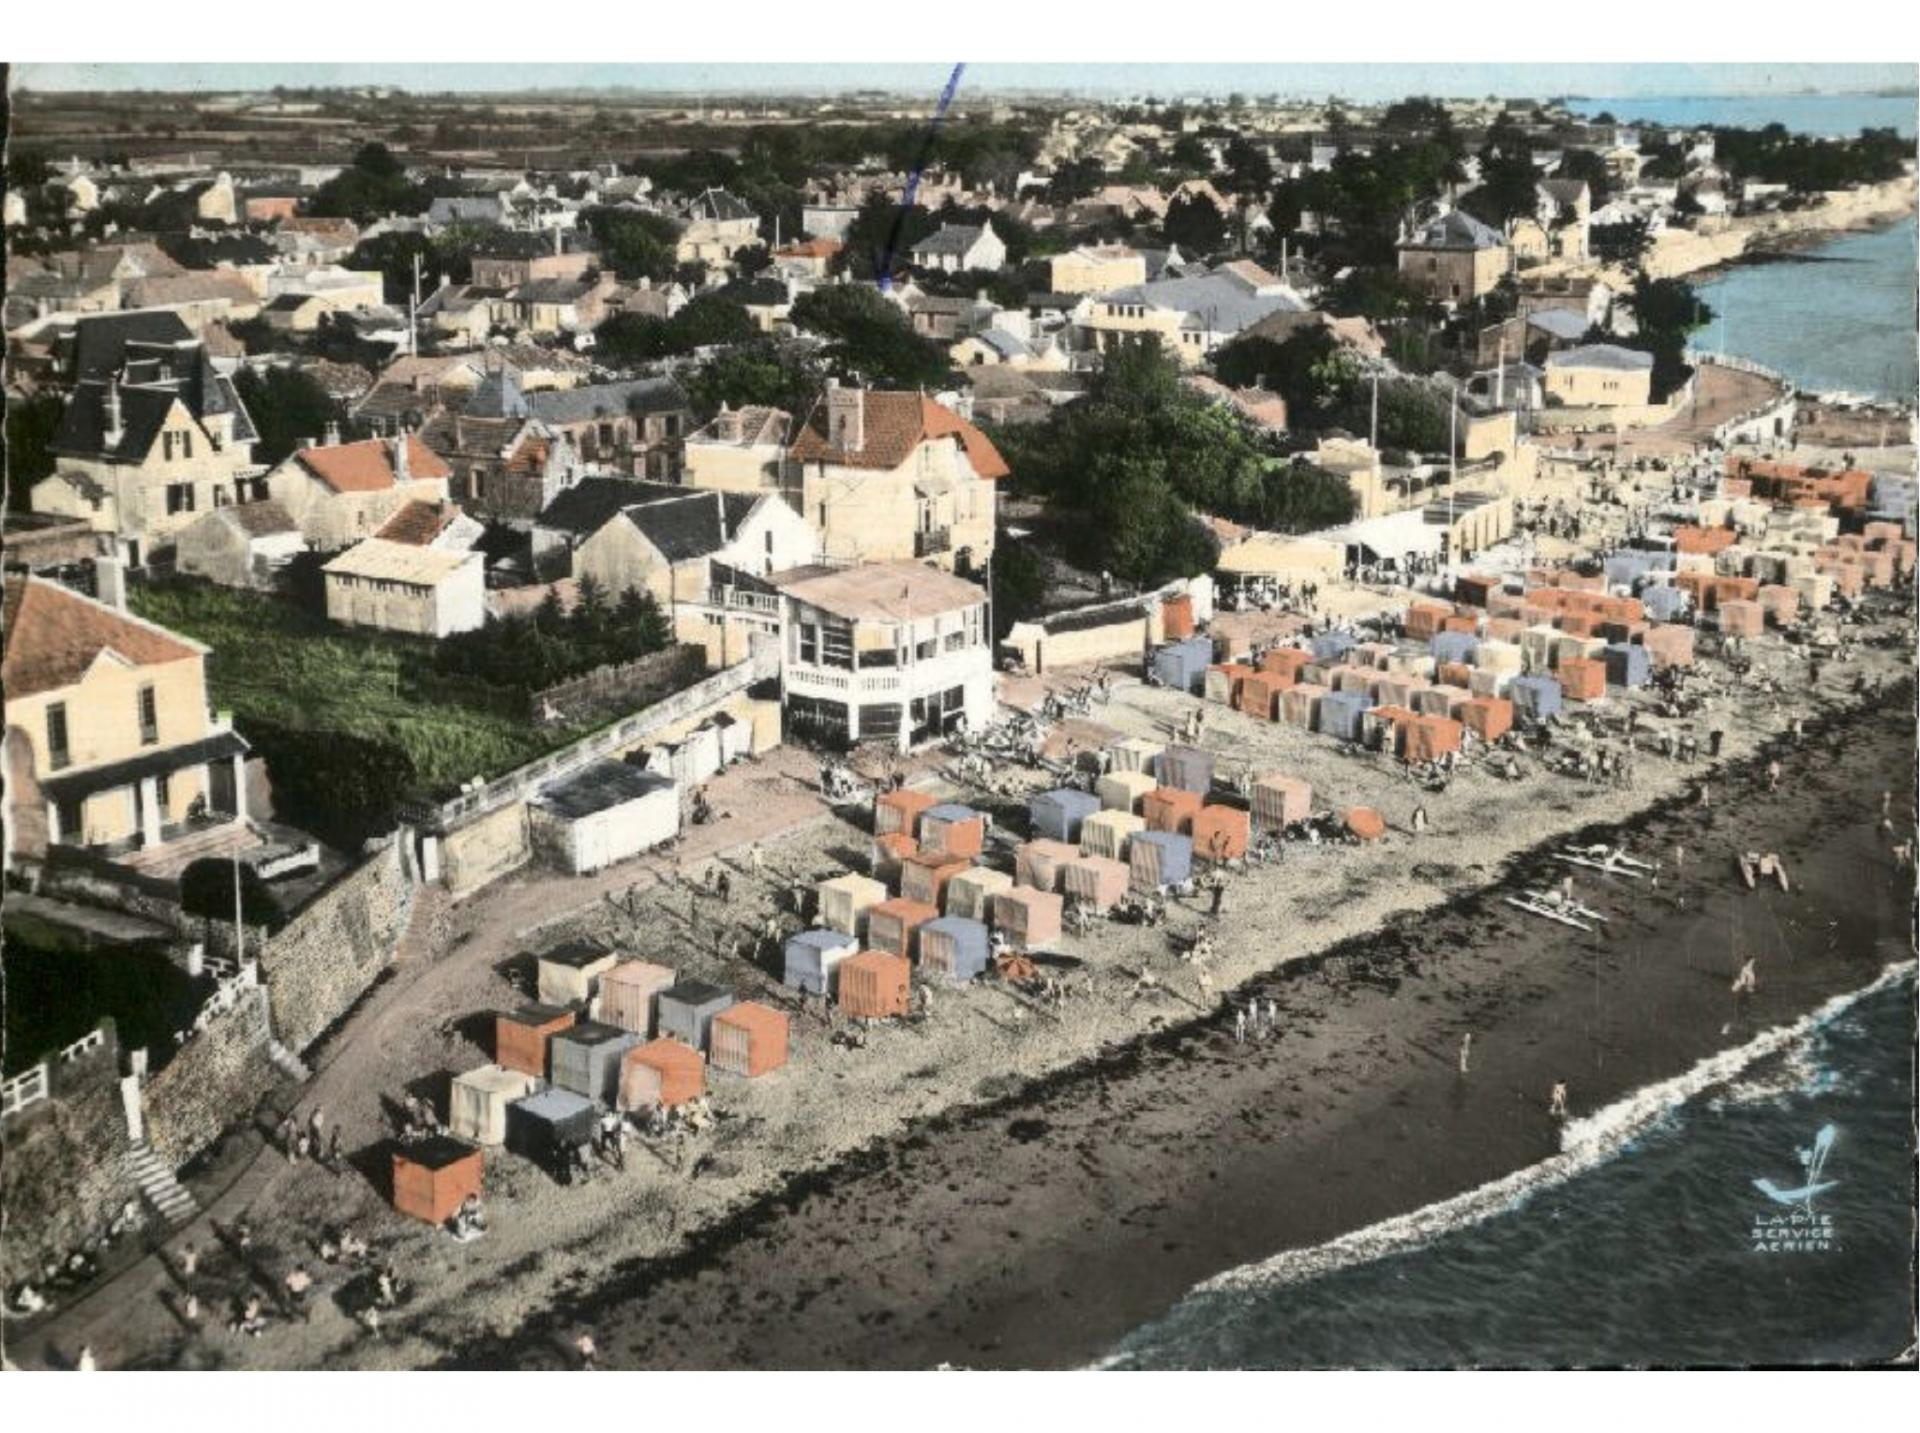 La grande plage 1965